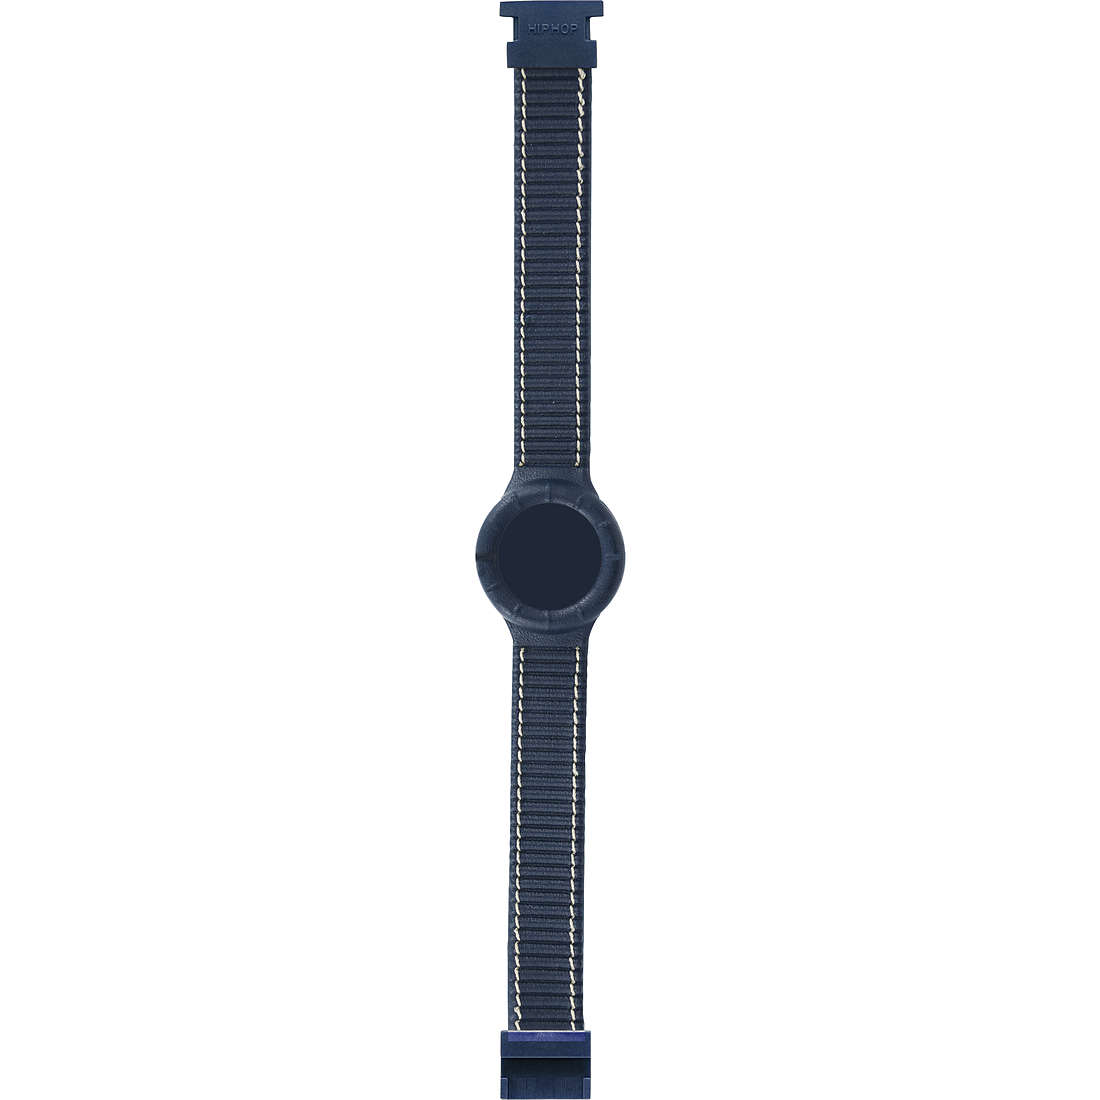 orologio accessorio unisex Hip Hop HBU0203